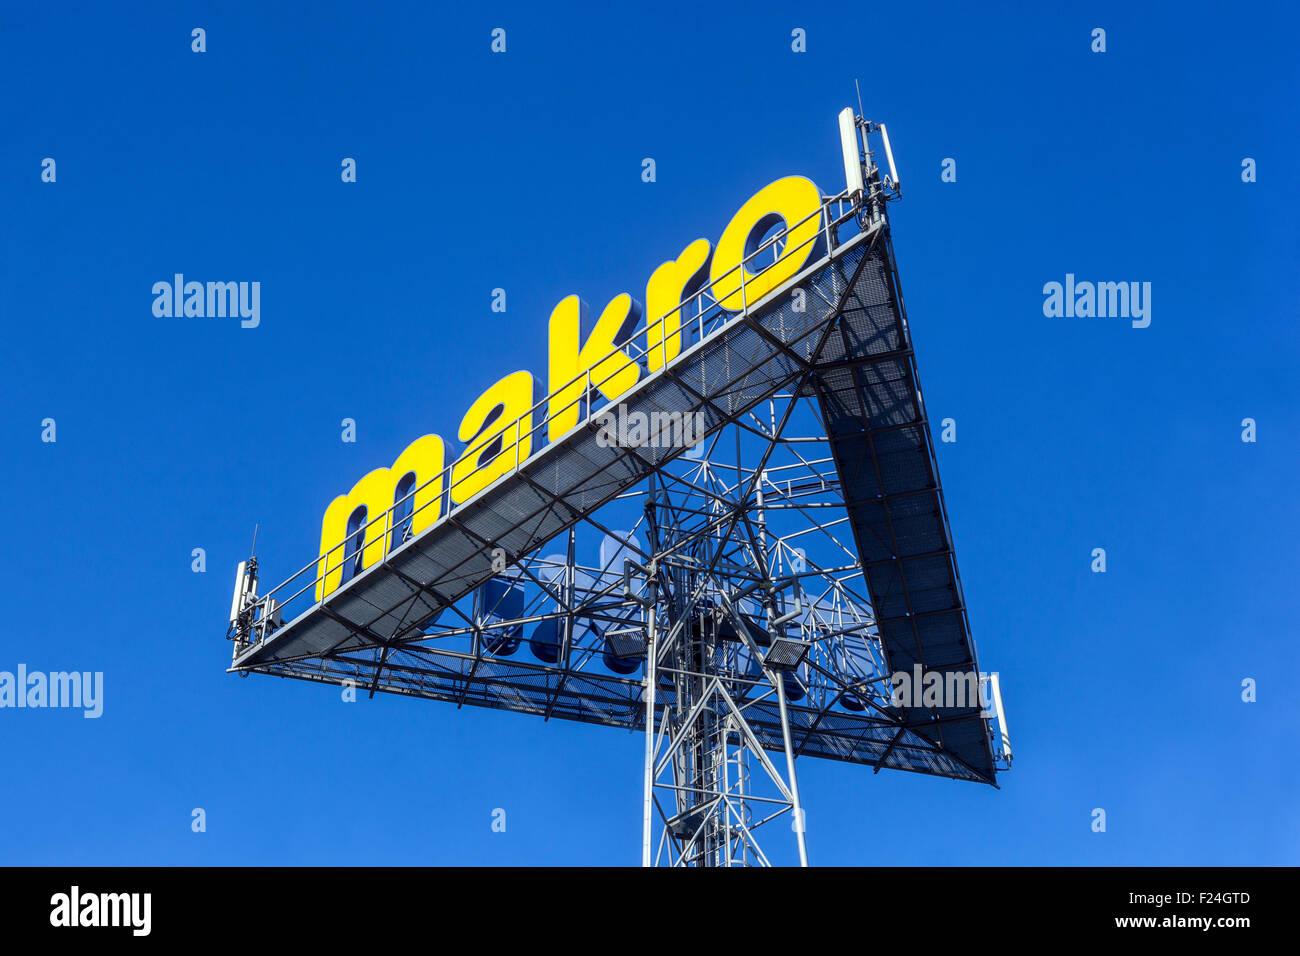 Makro, advertising pylon, sign, ad, Prague, Czech Republic - Stock Image